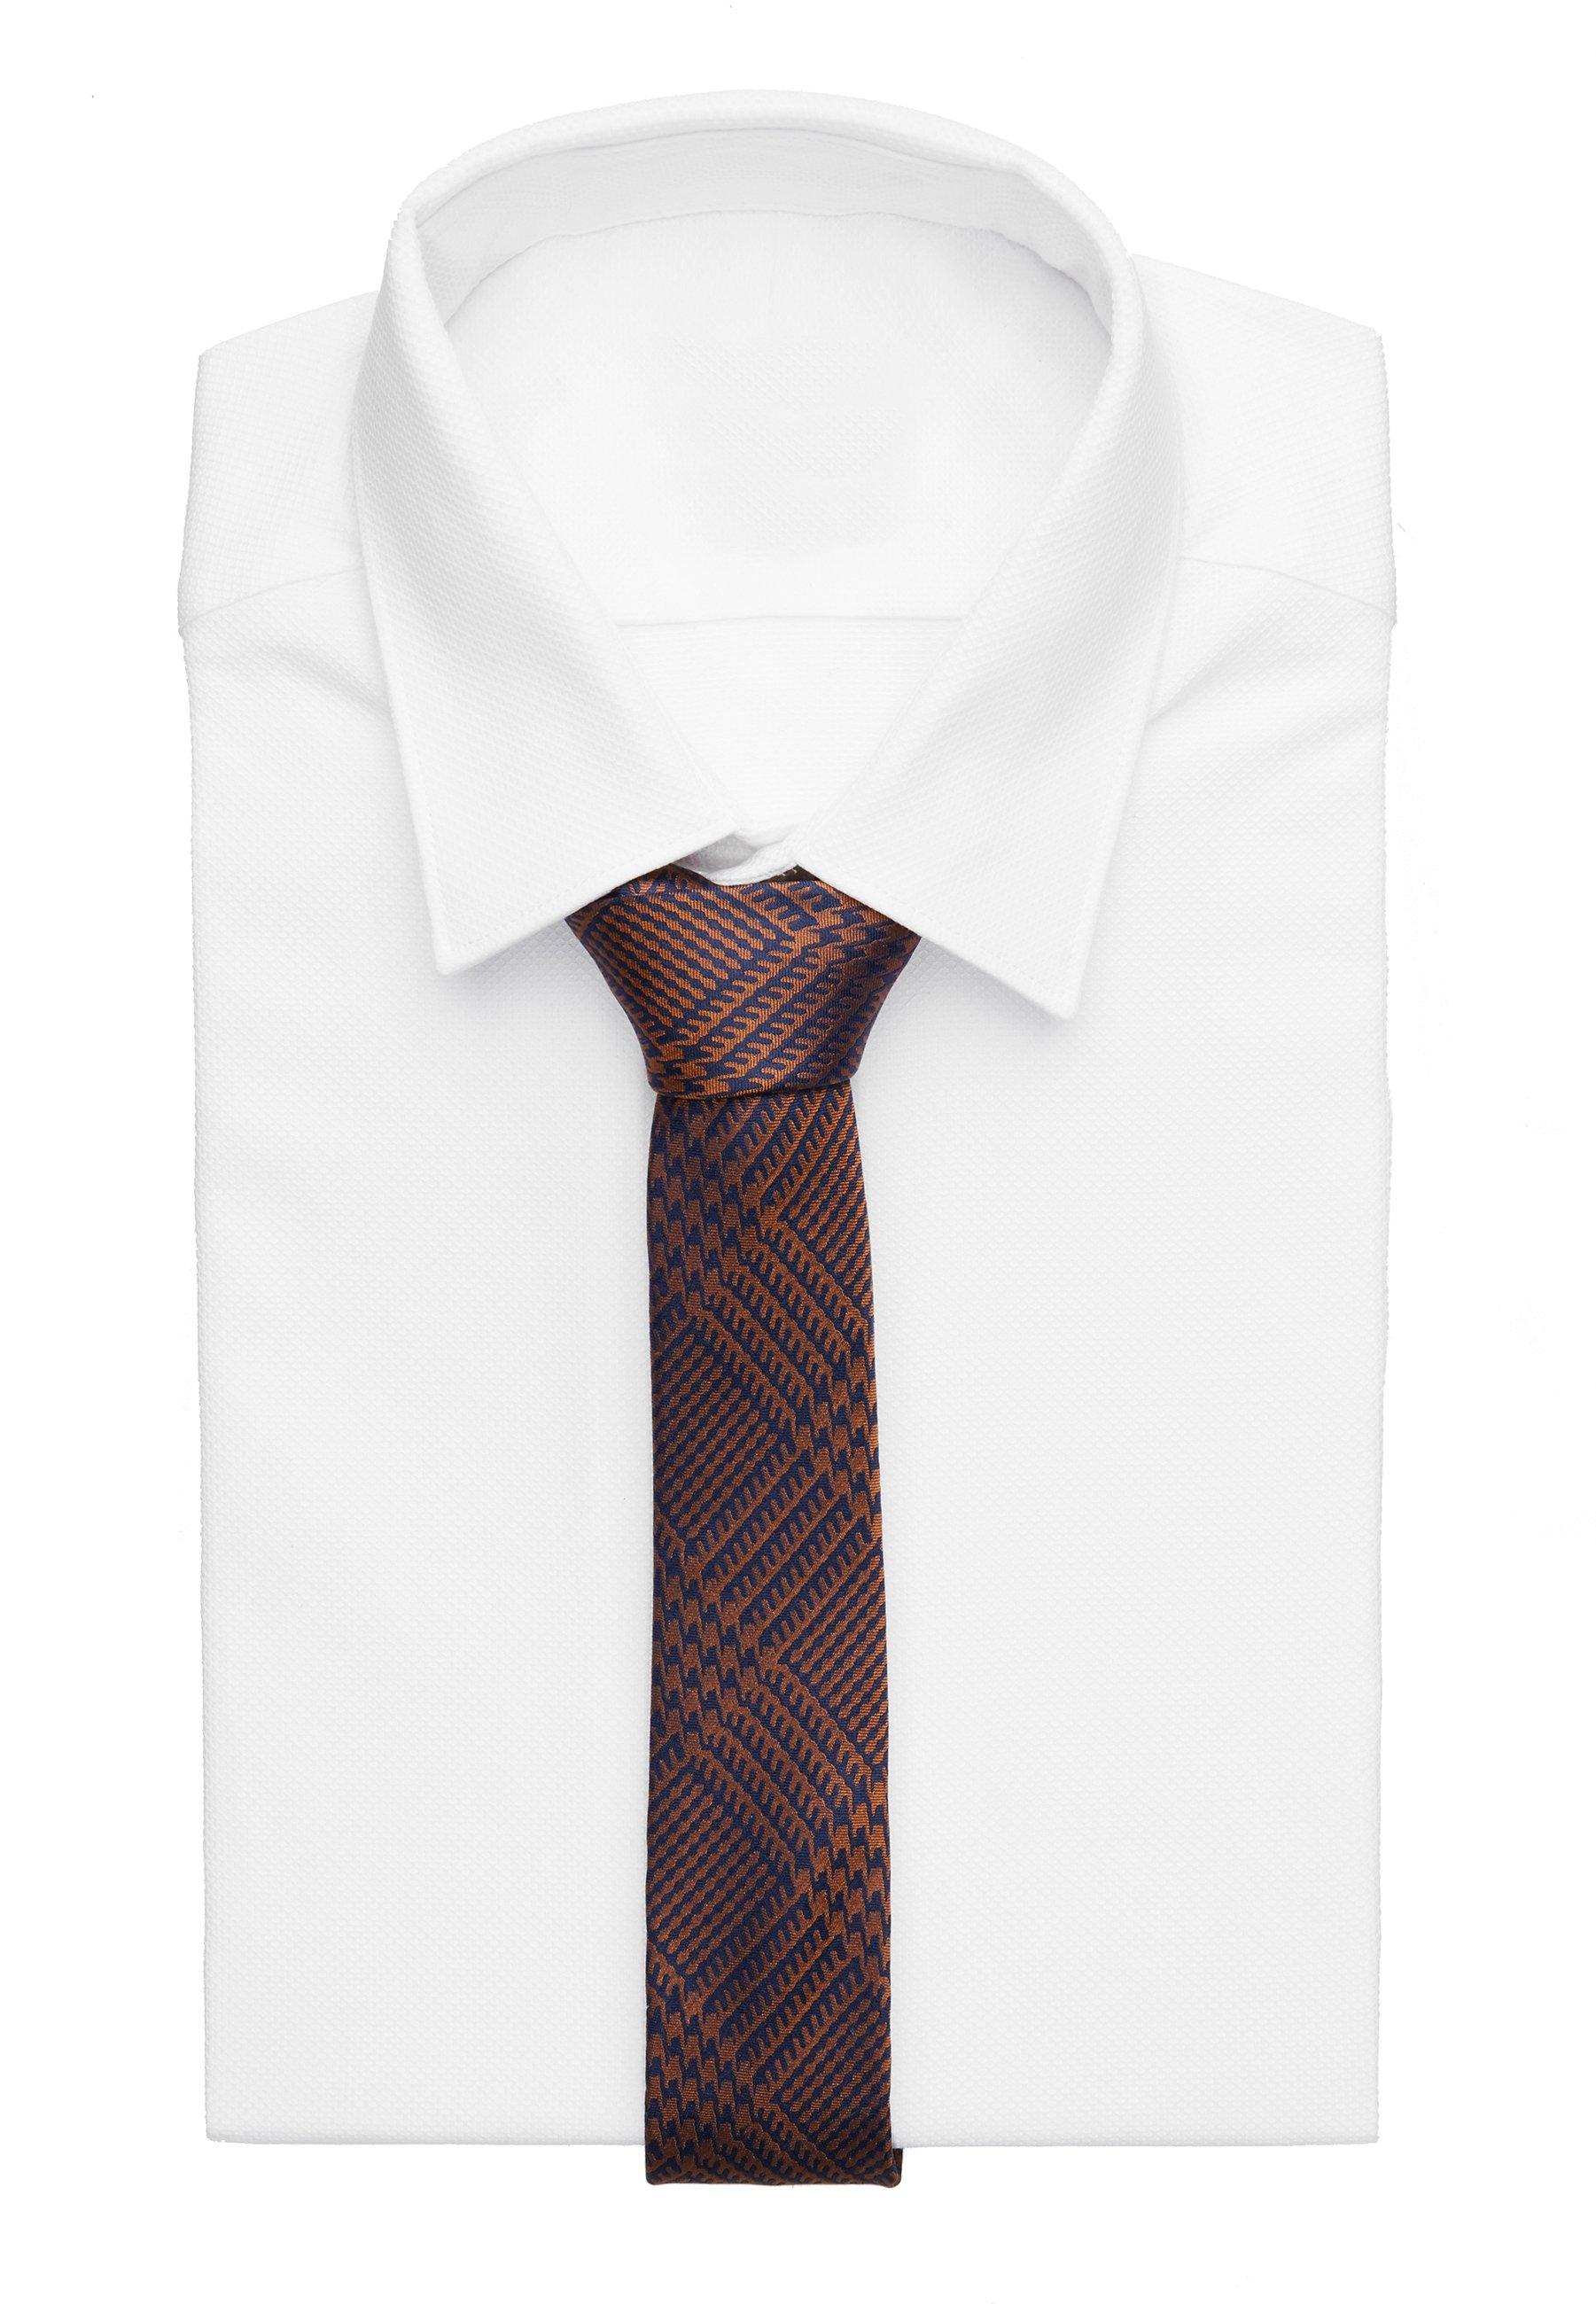 DRYKORN TIE SLIM - Krawatte - orange/braun - Herrenaccessoires SCGRm